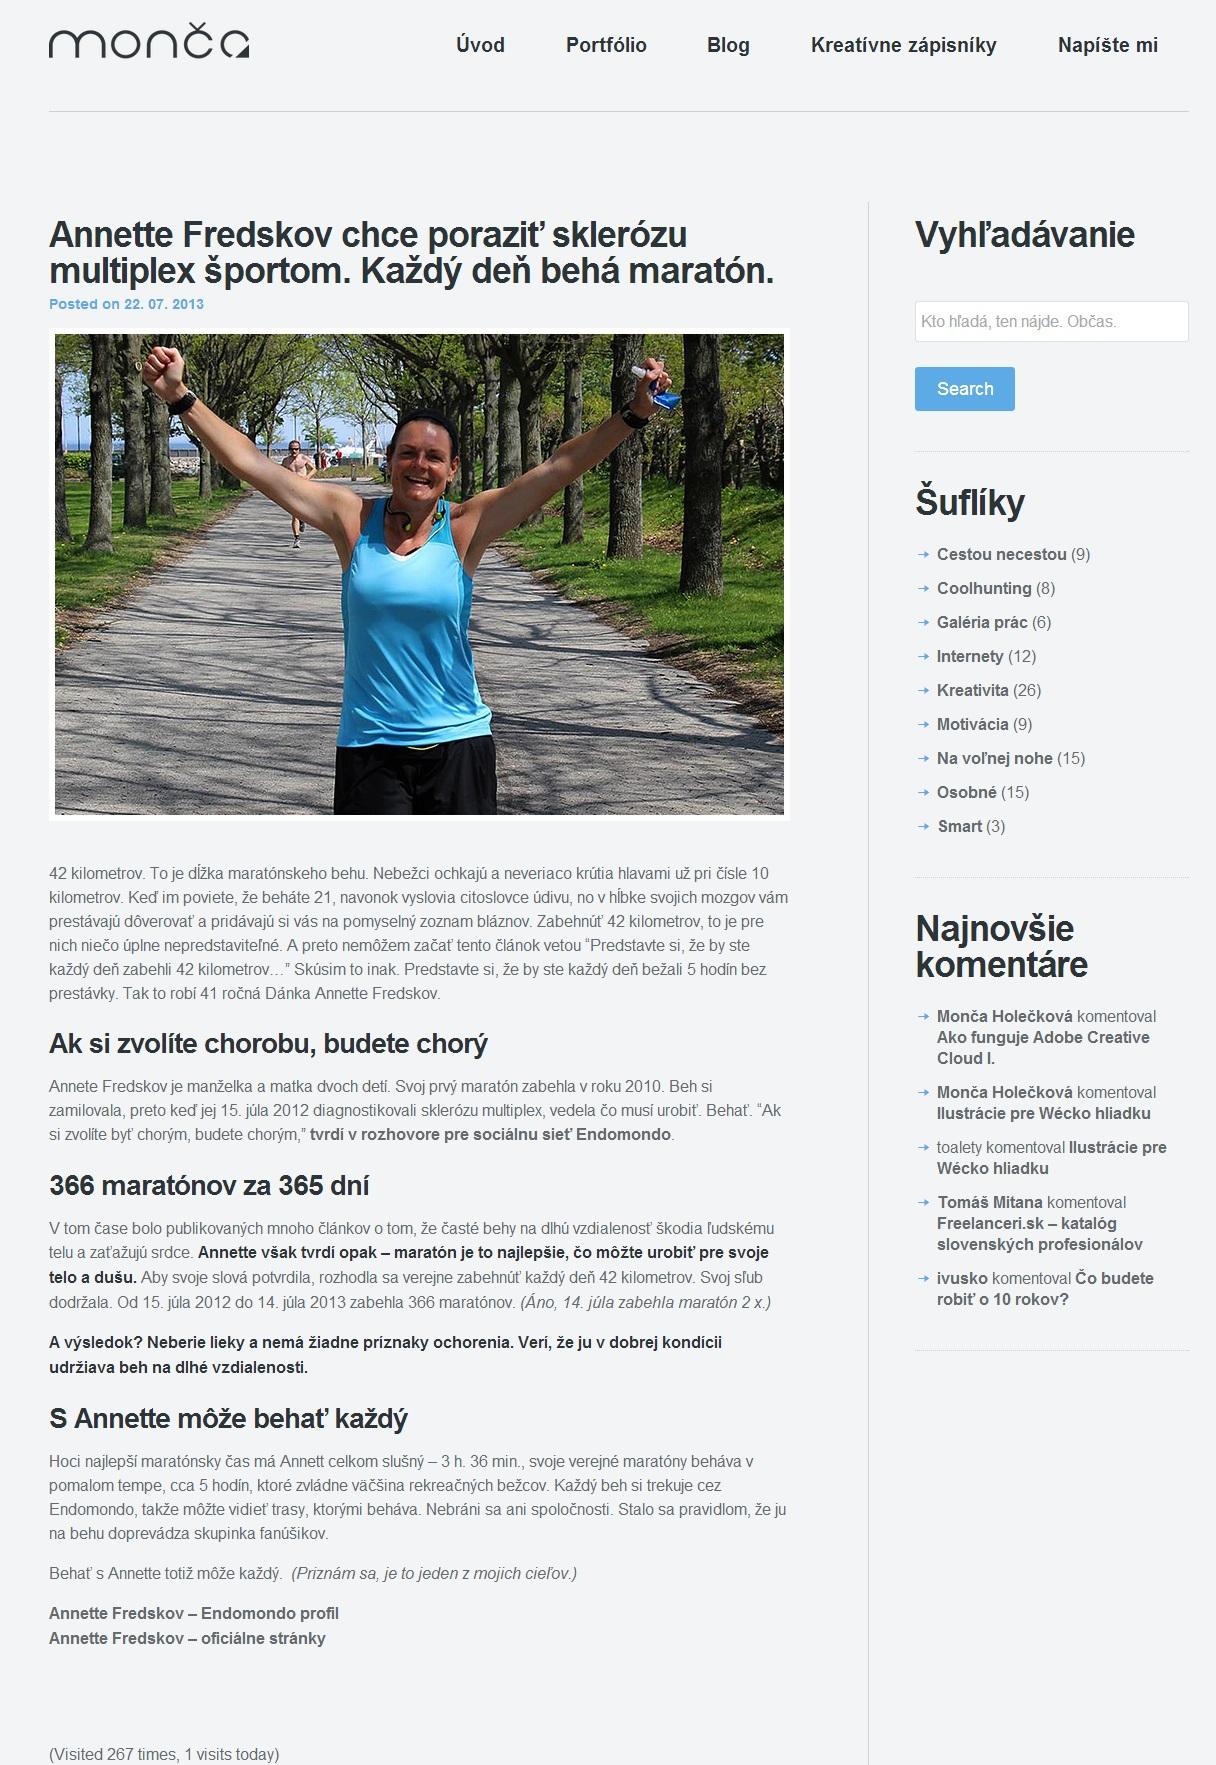 monca.sk 2013.07.22 slovakisk